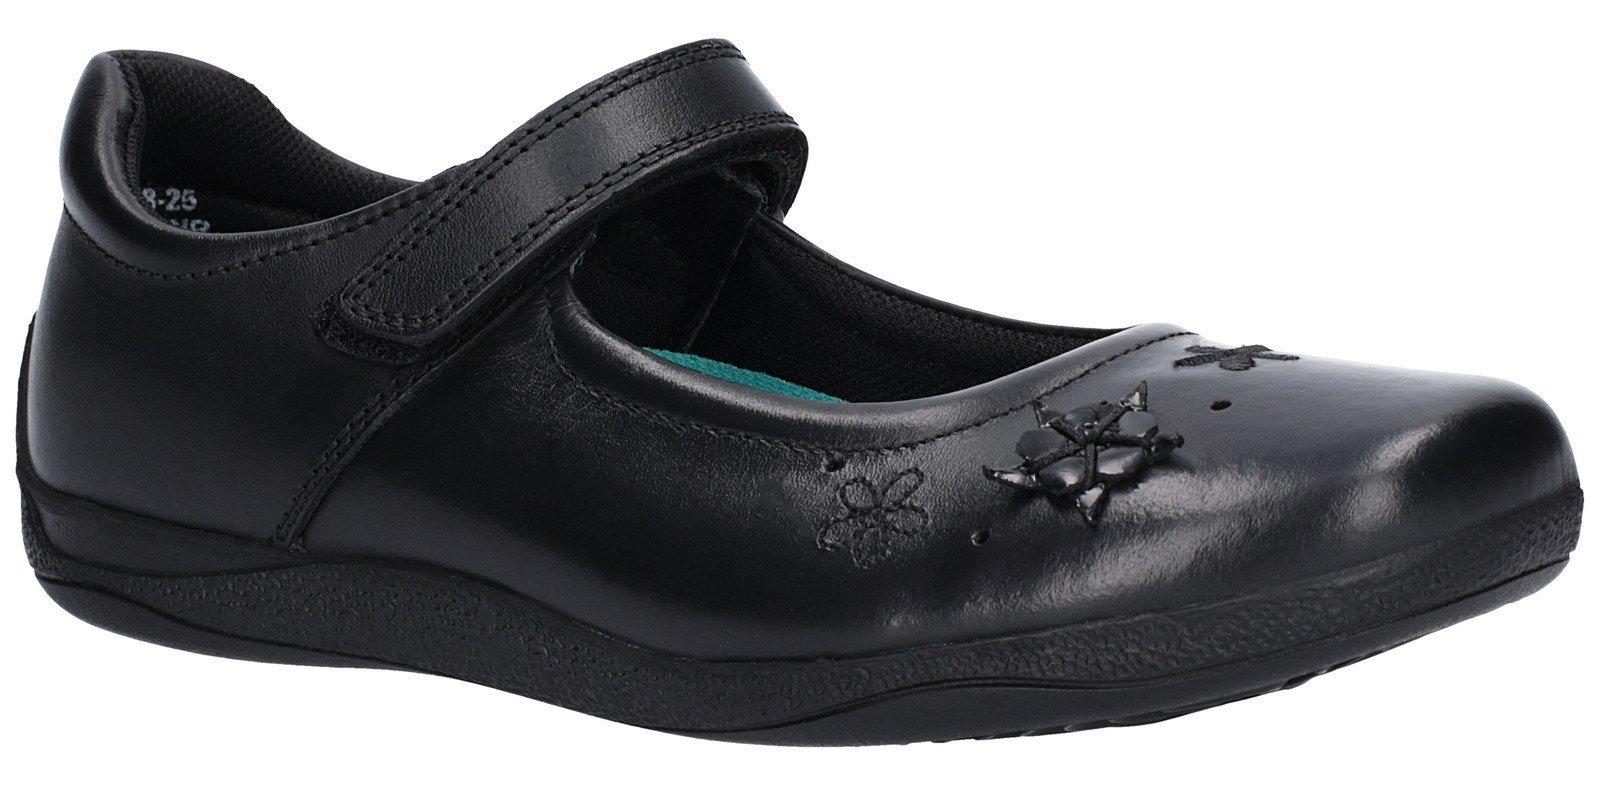 Hush Puppies Kid's Candy Junior Touch Fastening Shoe Black 27456 - Black 10 UK